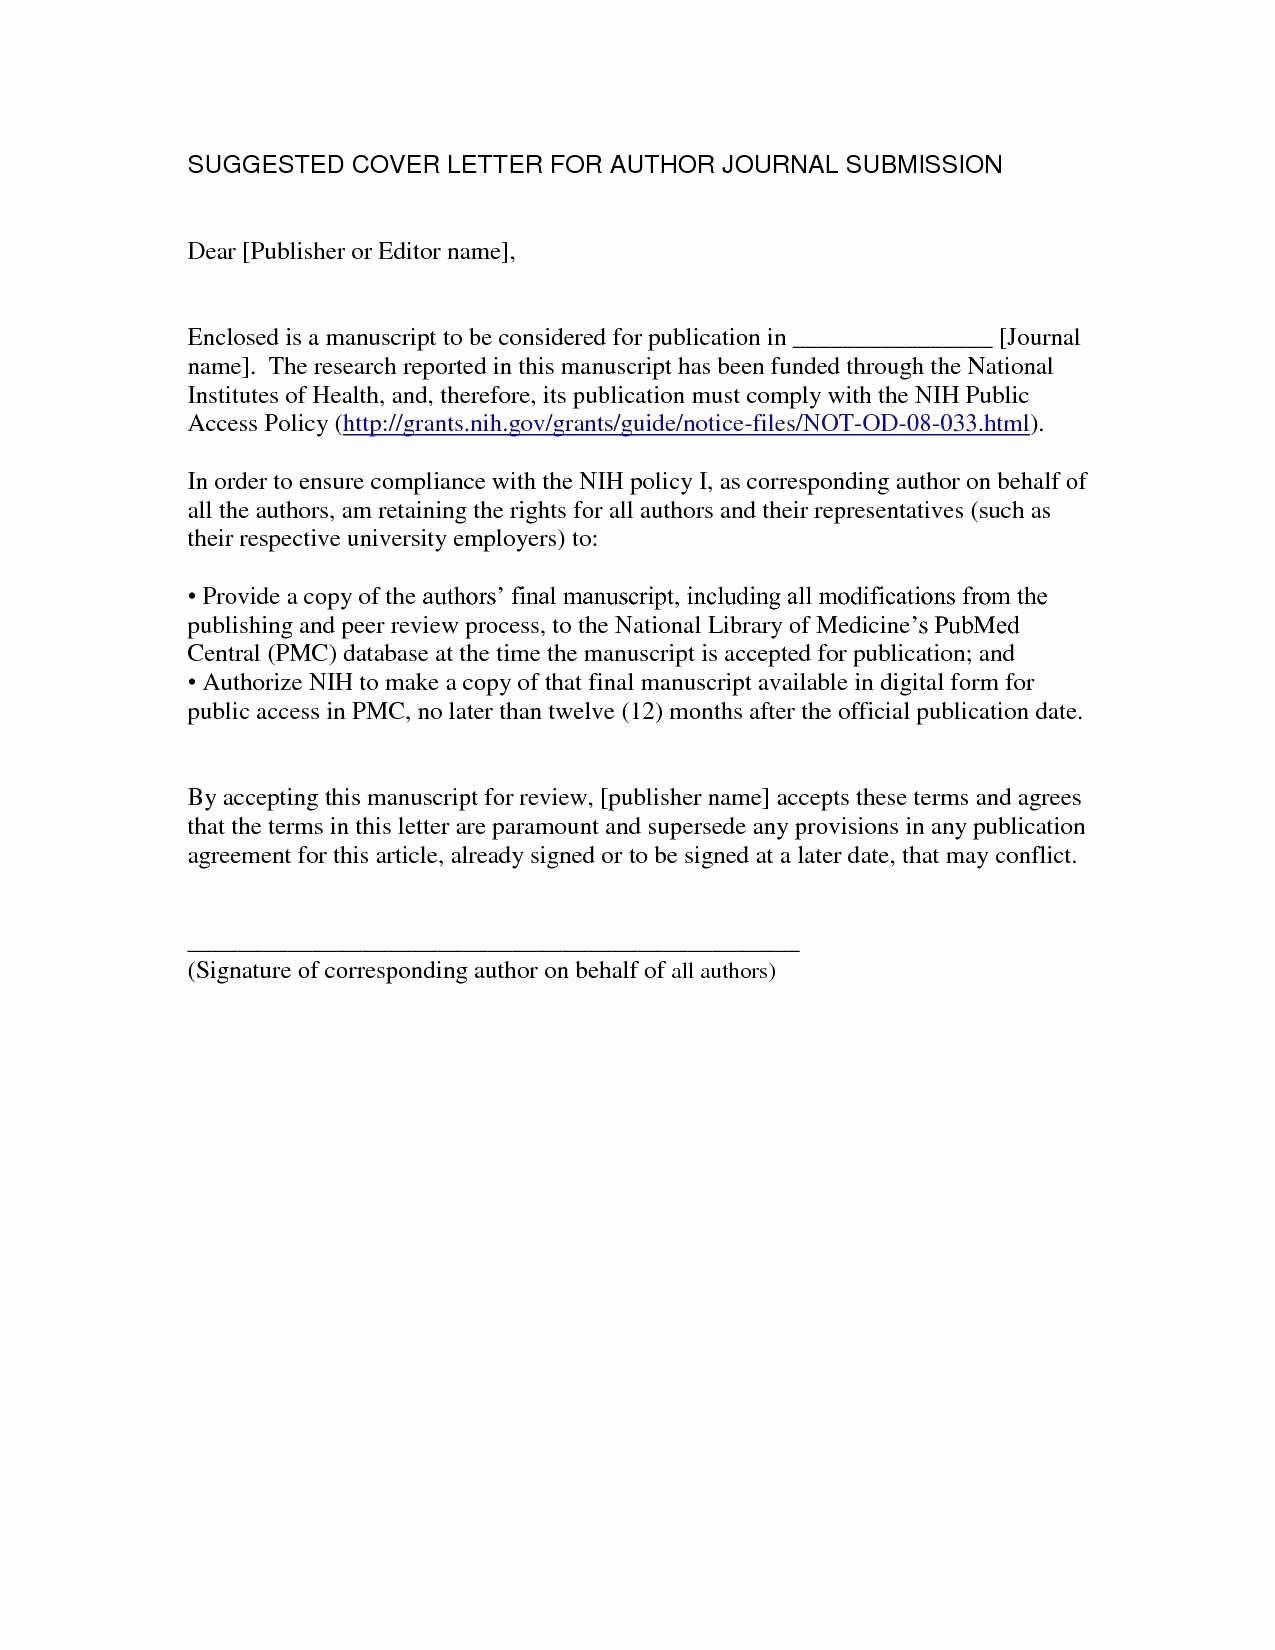 Interior Design Cv Personal Statement Neu Cover Letter For A